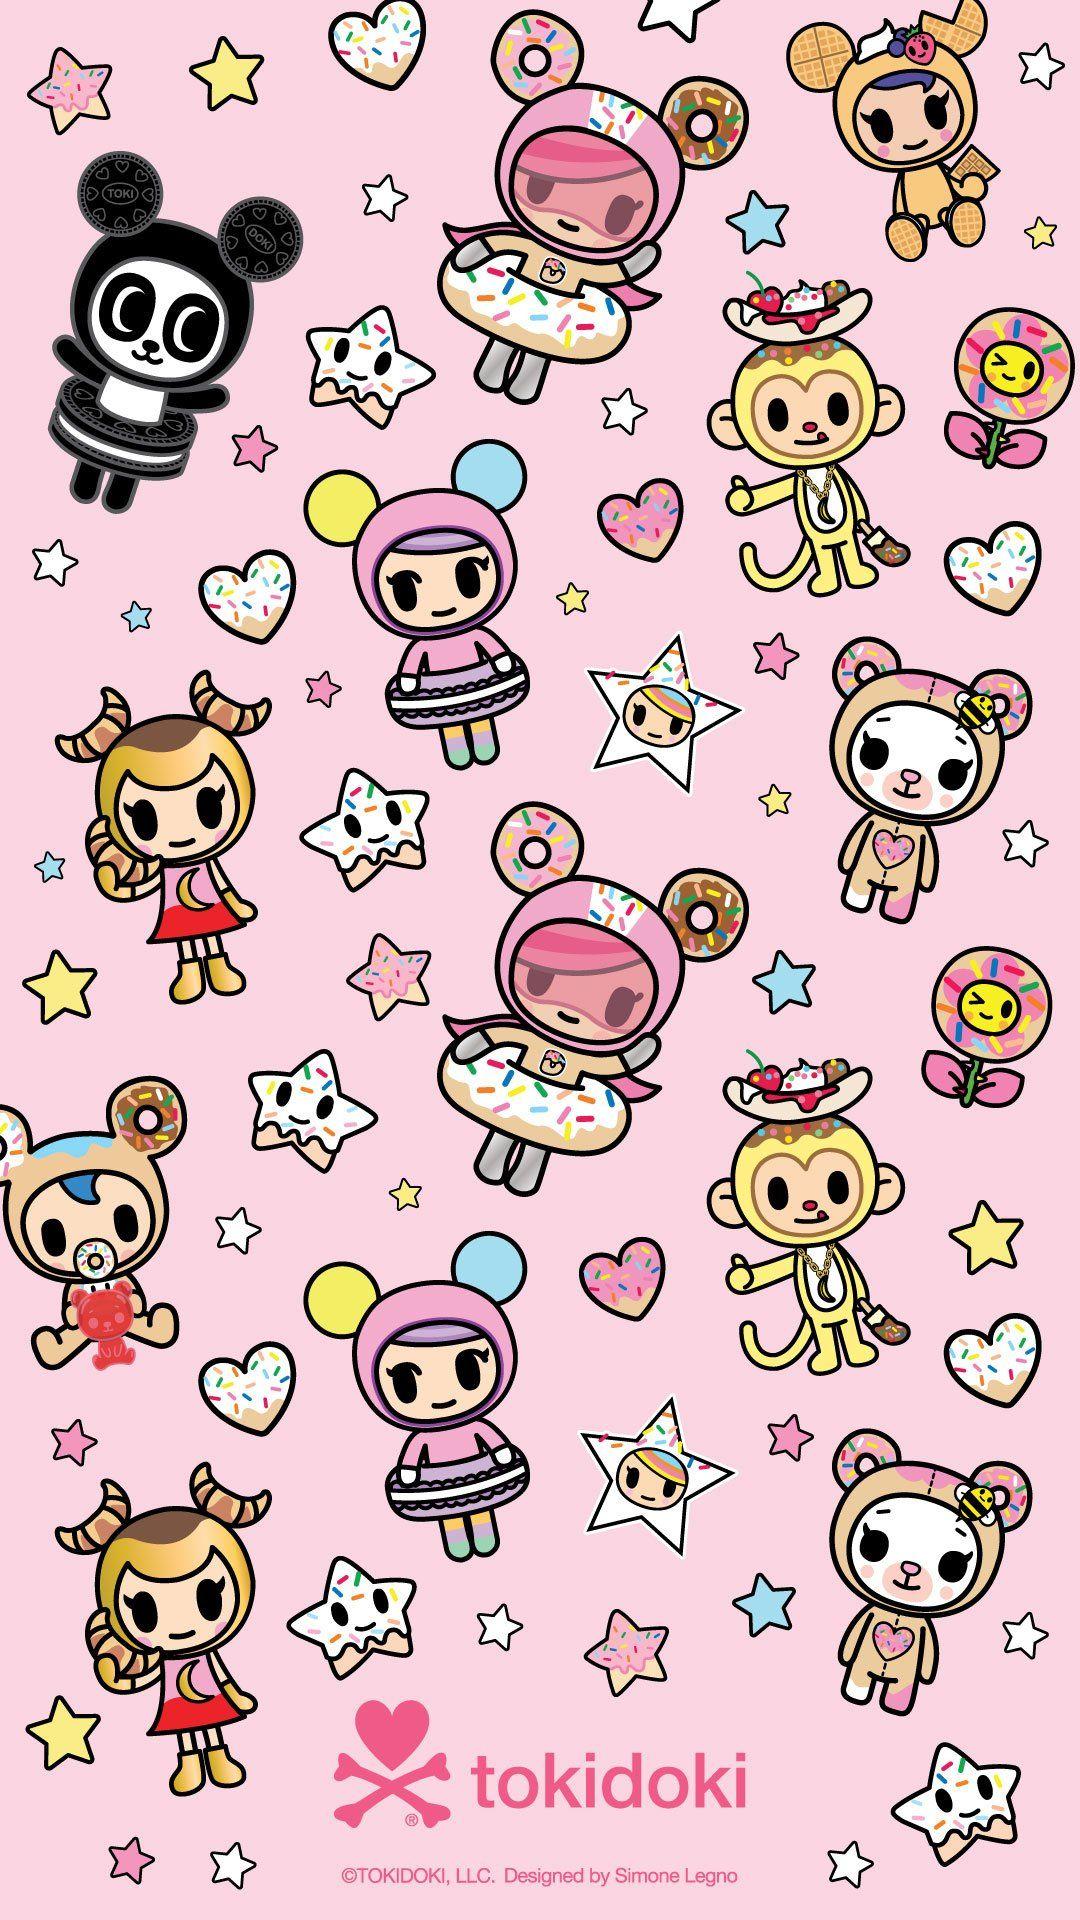 Donutella And Her Sweet Friends Wallpapers Tokidoki In 2021 Kawaii Girl Drawings Tokidoki Characters Friends Wallpaper